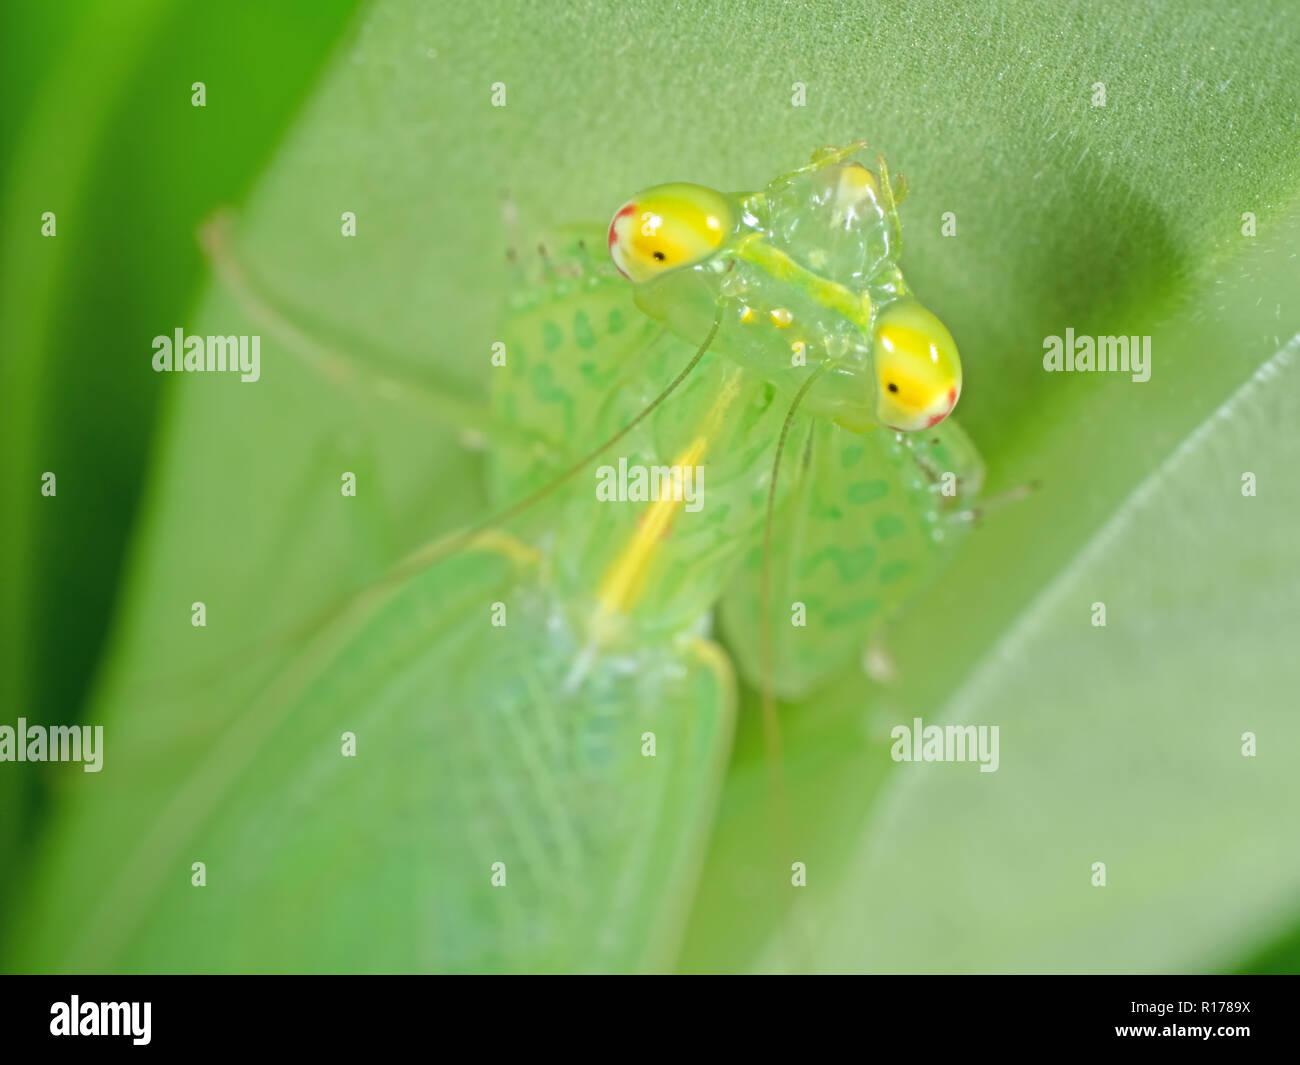 Makrofotografie der Leiter der Gottesanbeterin auf grünem Blatt Stockbild